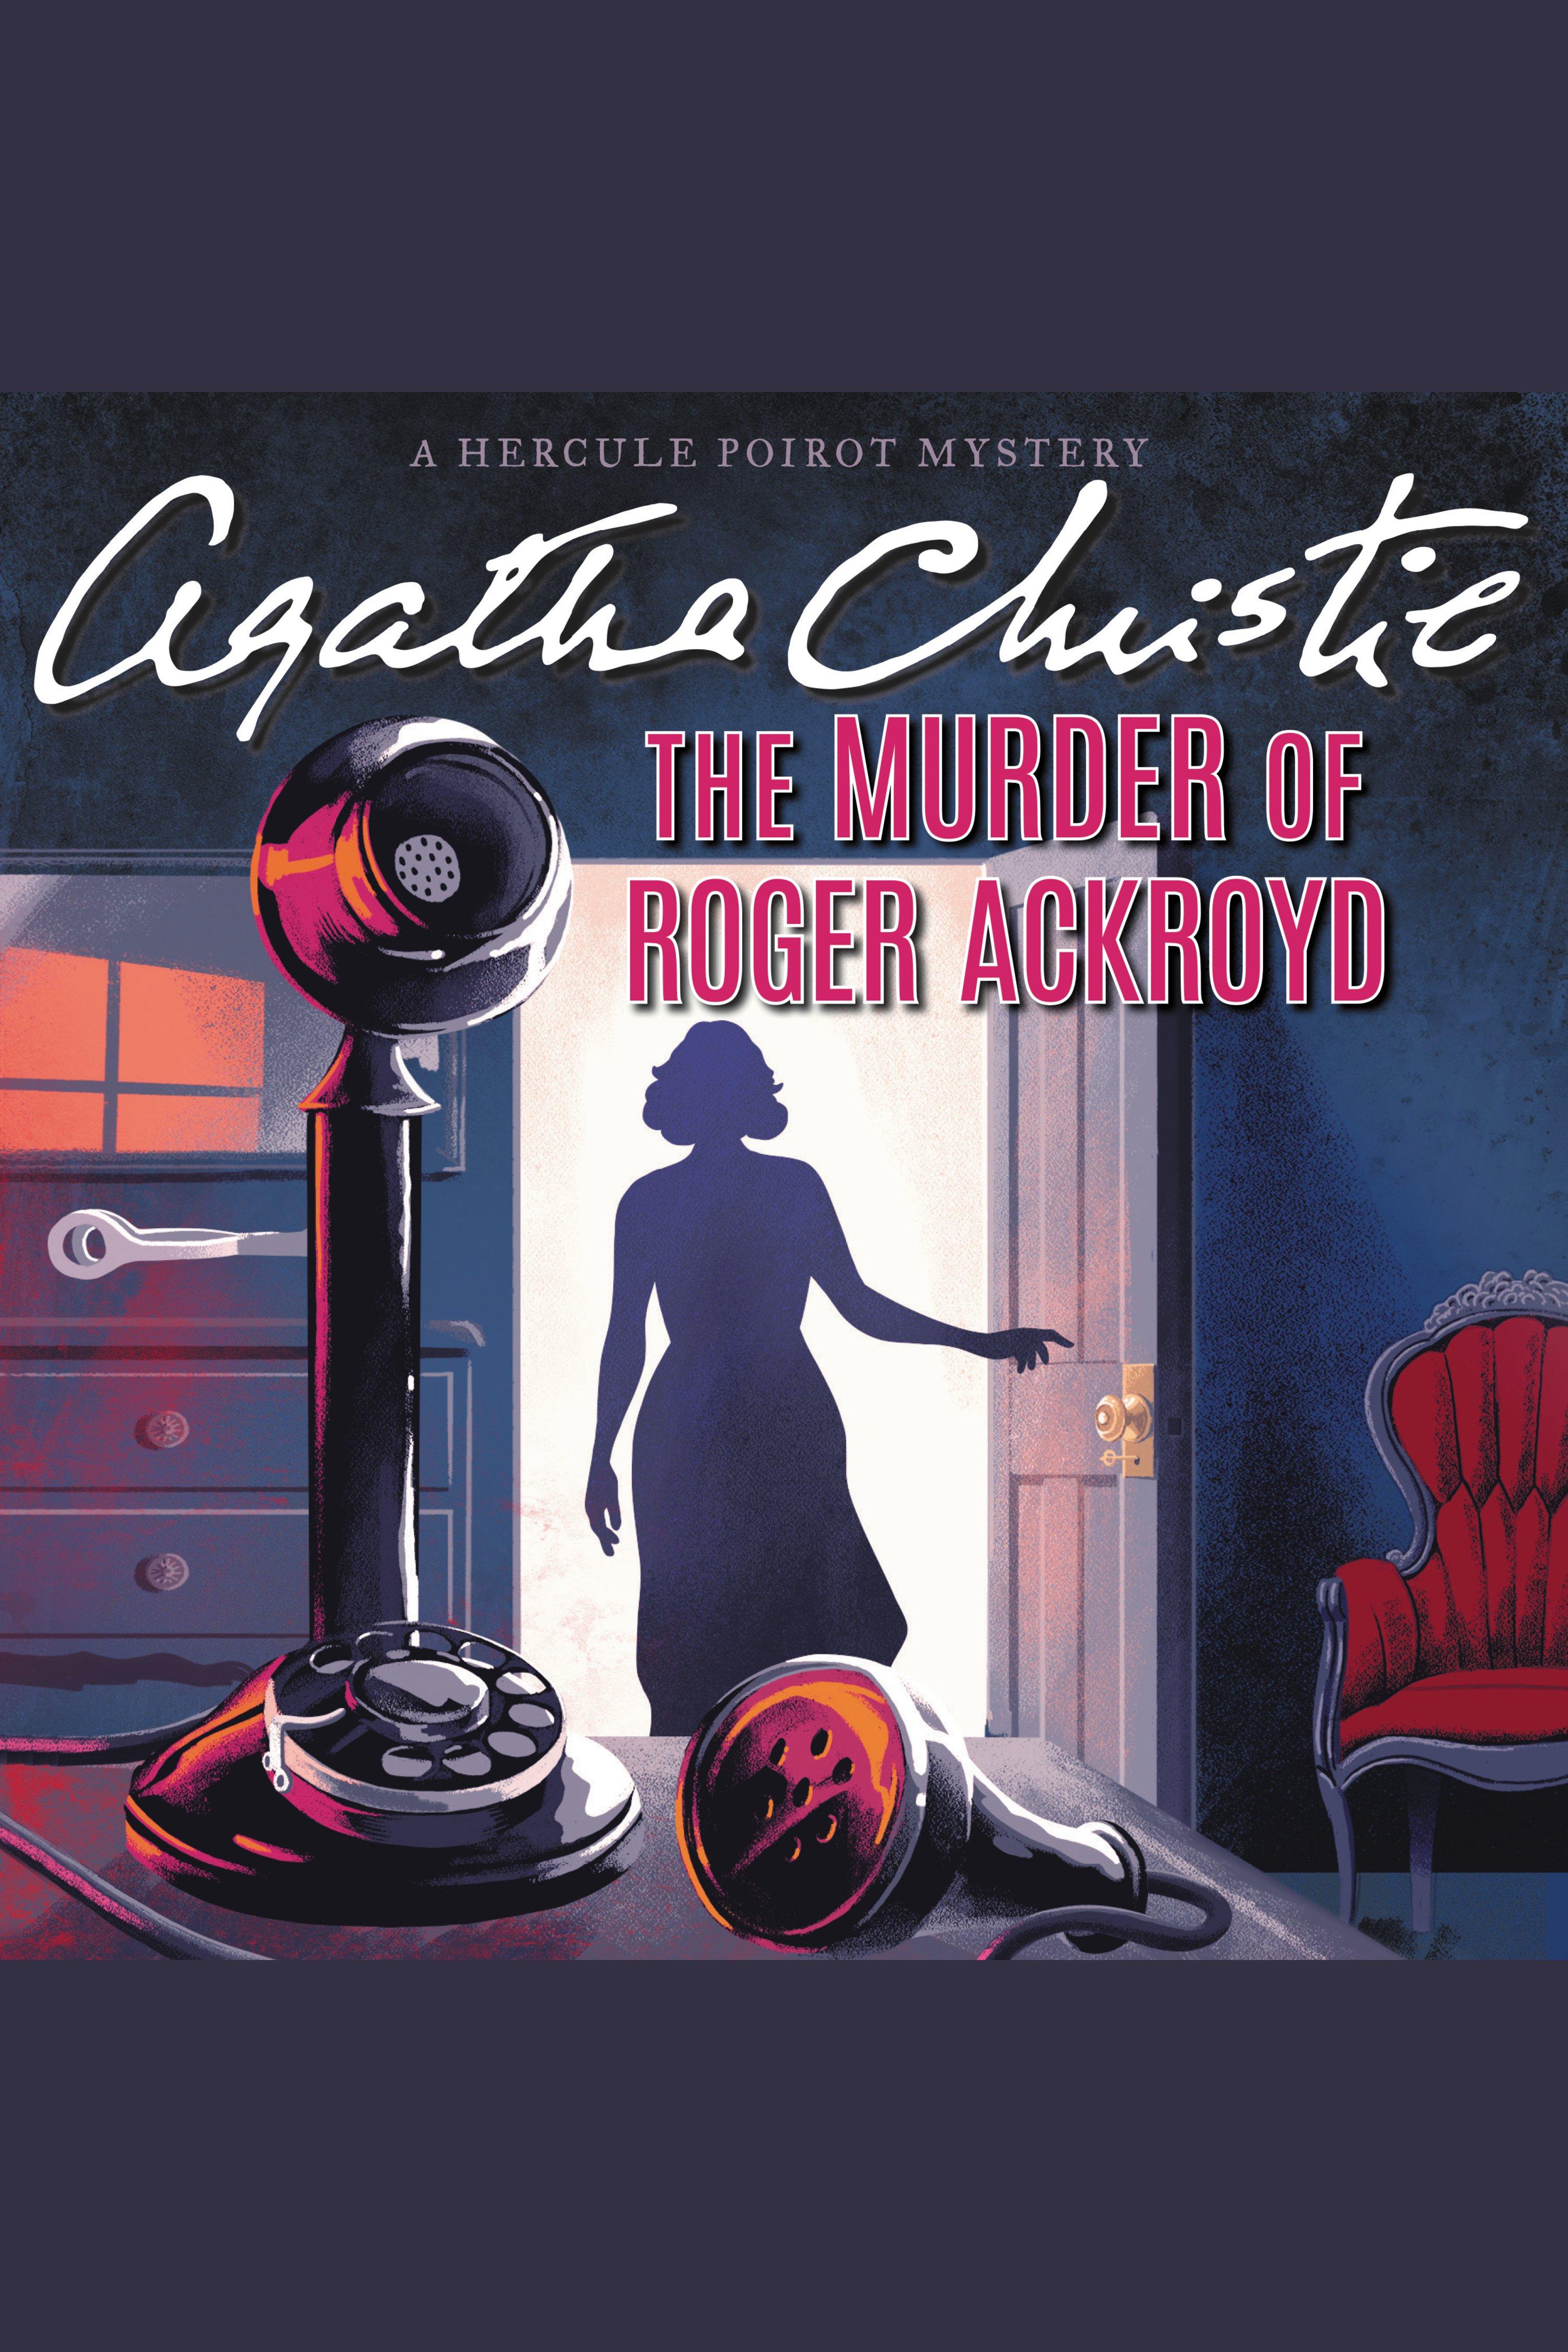 Murder of Roger Ackroyd, The A Hercule Poirot Mystery